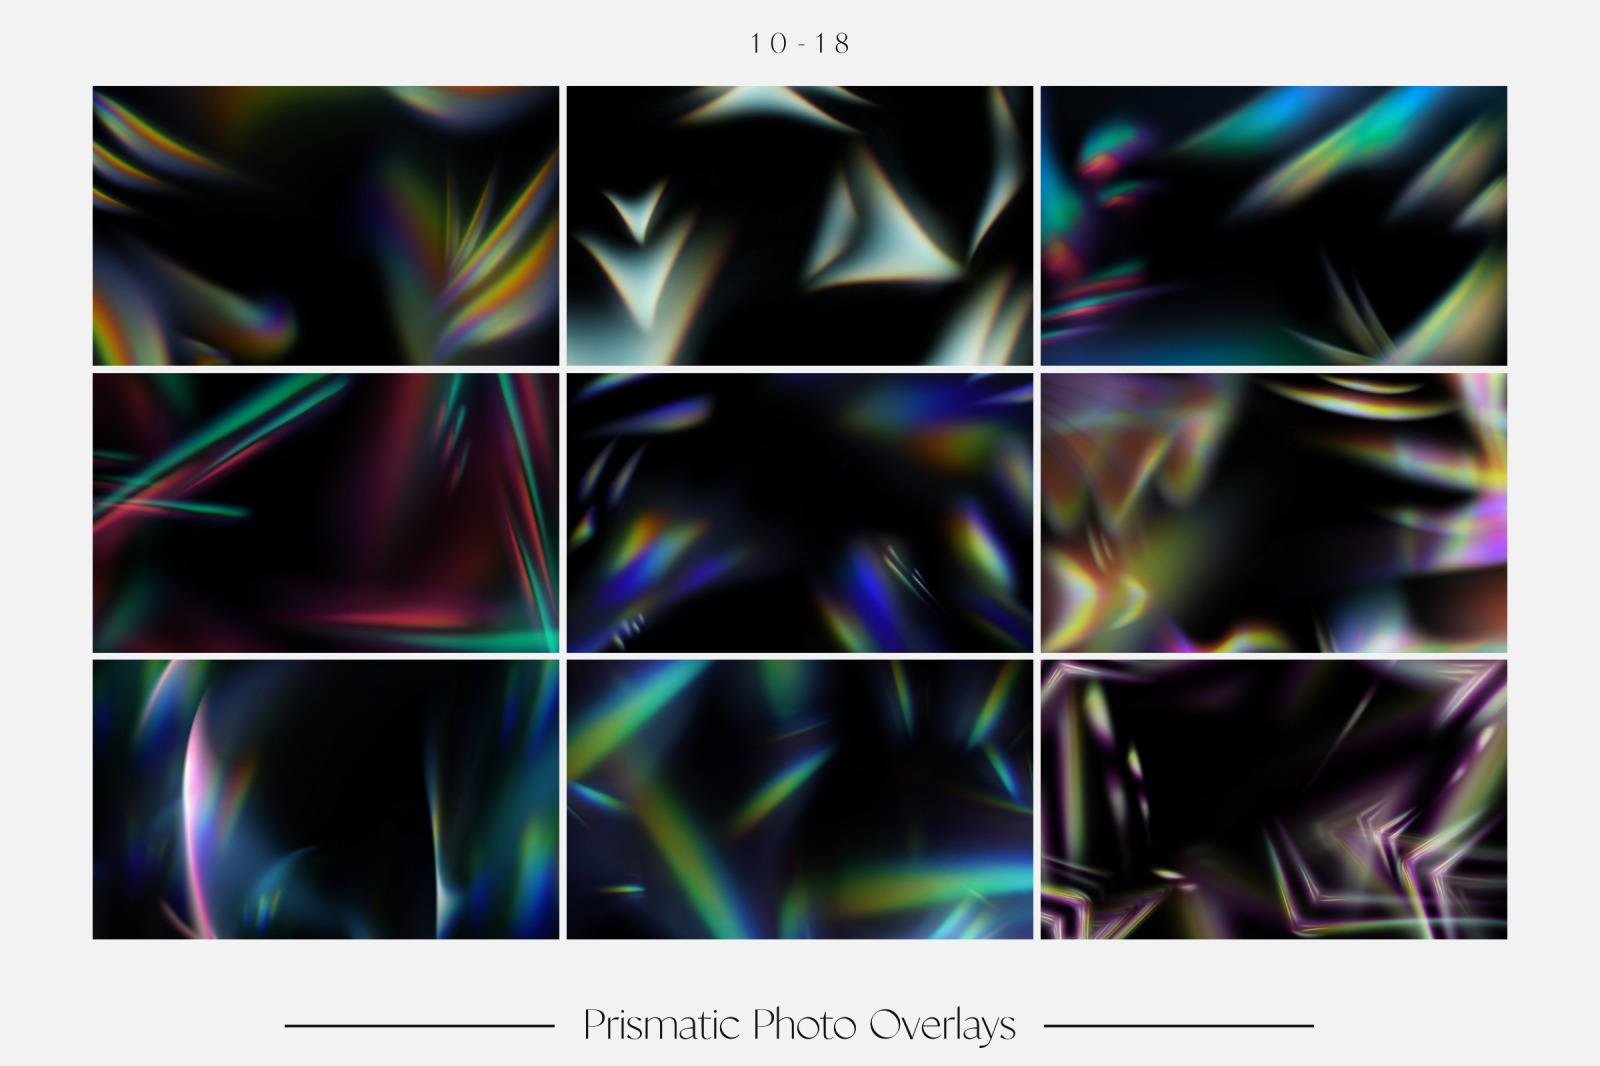 Prismatic Photo Overlays